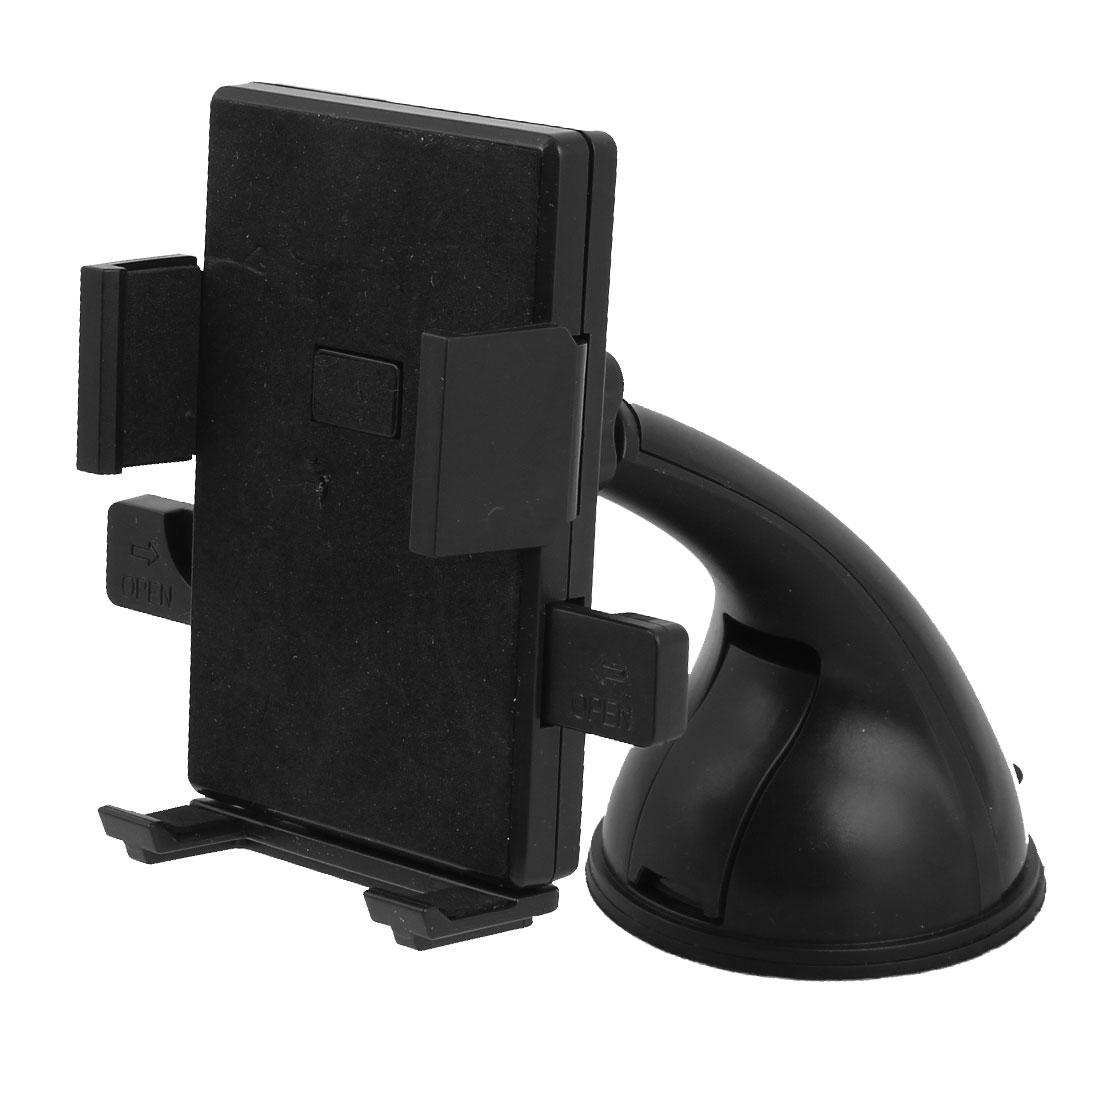 Car Truck Windshield Adjustable Black Plastic Bracket Holder for GPS Cellphone